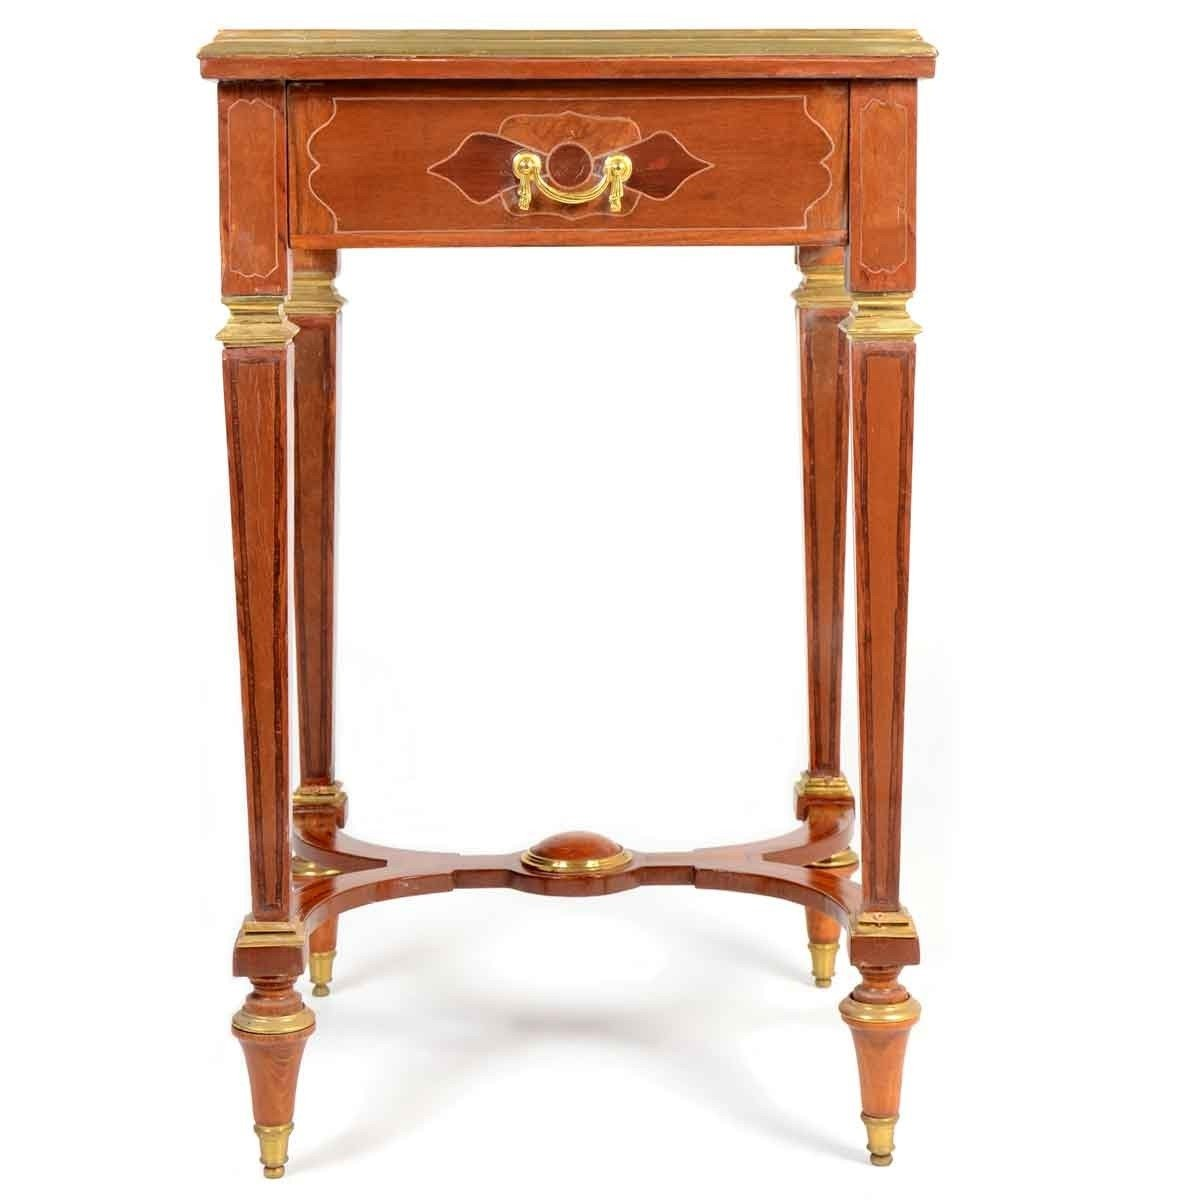 Tisch - Stil Antik | Barock | Rokkoko | Louis XV / XVI | Klassische | Handgefertigt | Massivholz